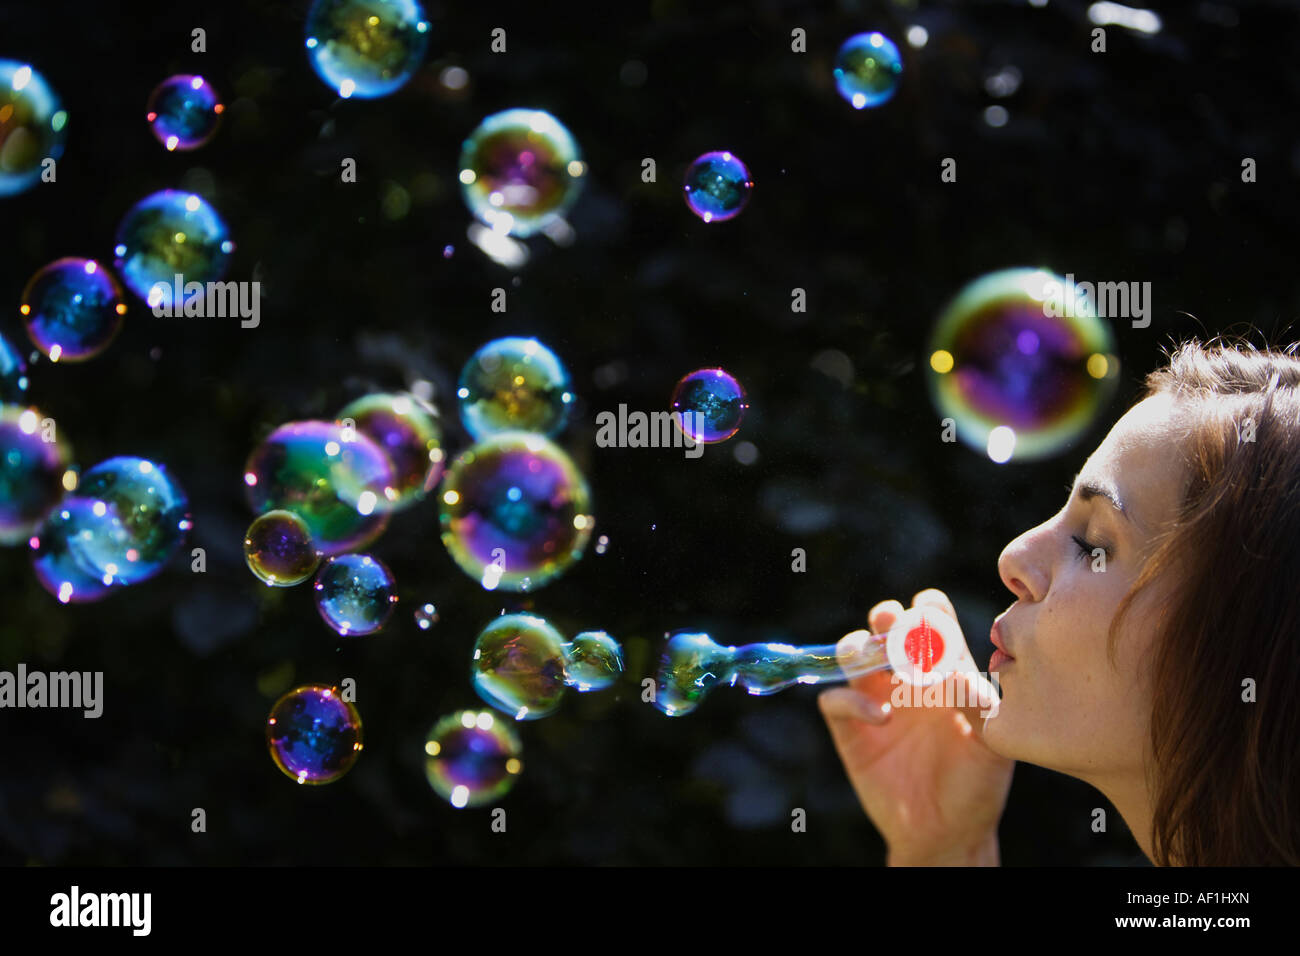 Woman with soap bubbles, Junge Frau blaest Seifenblasen in die Luft Stock Photo